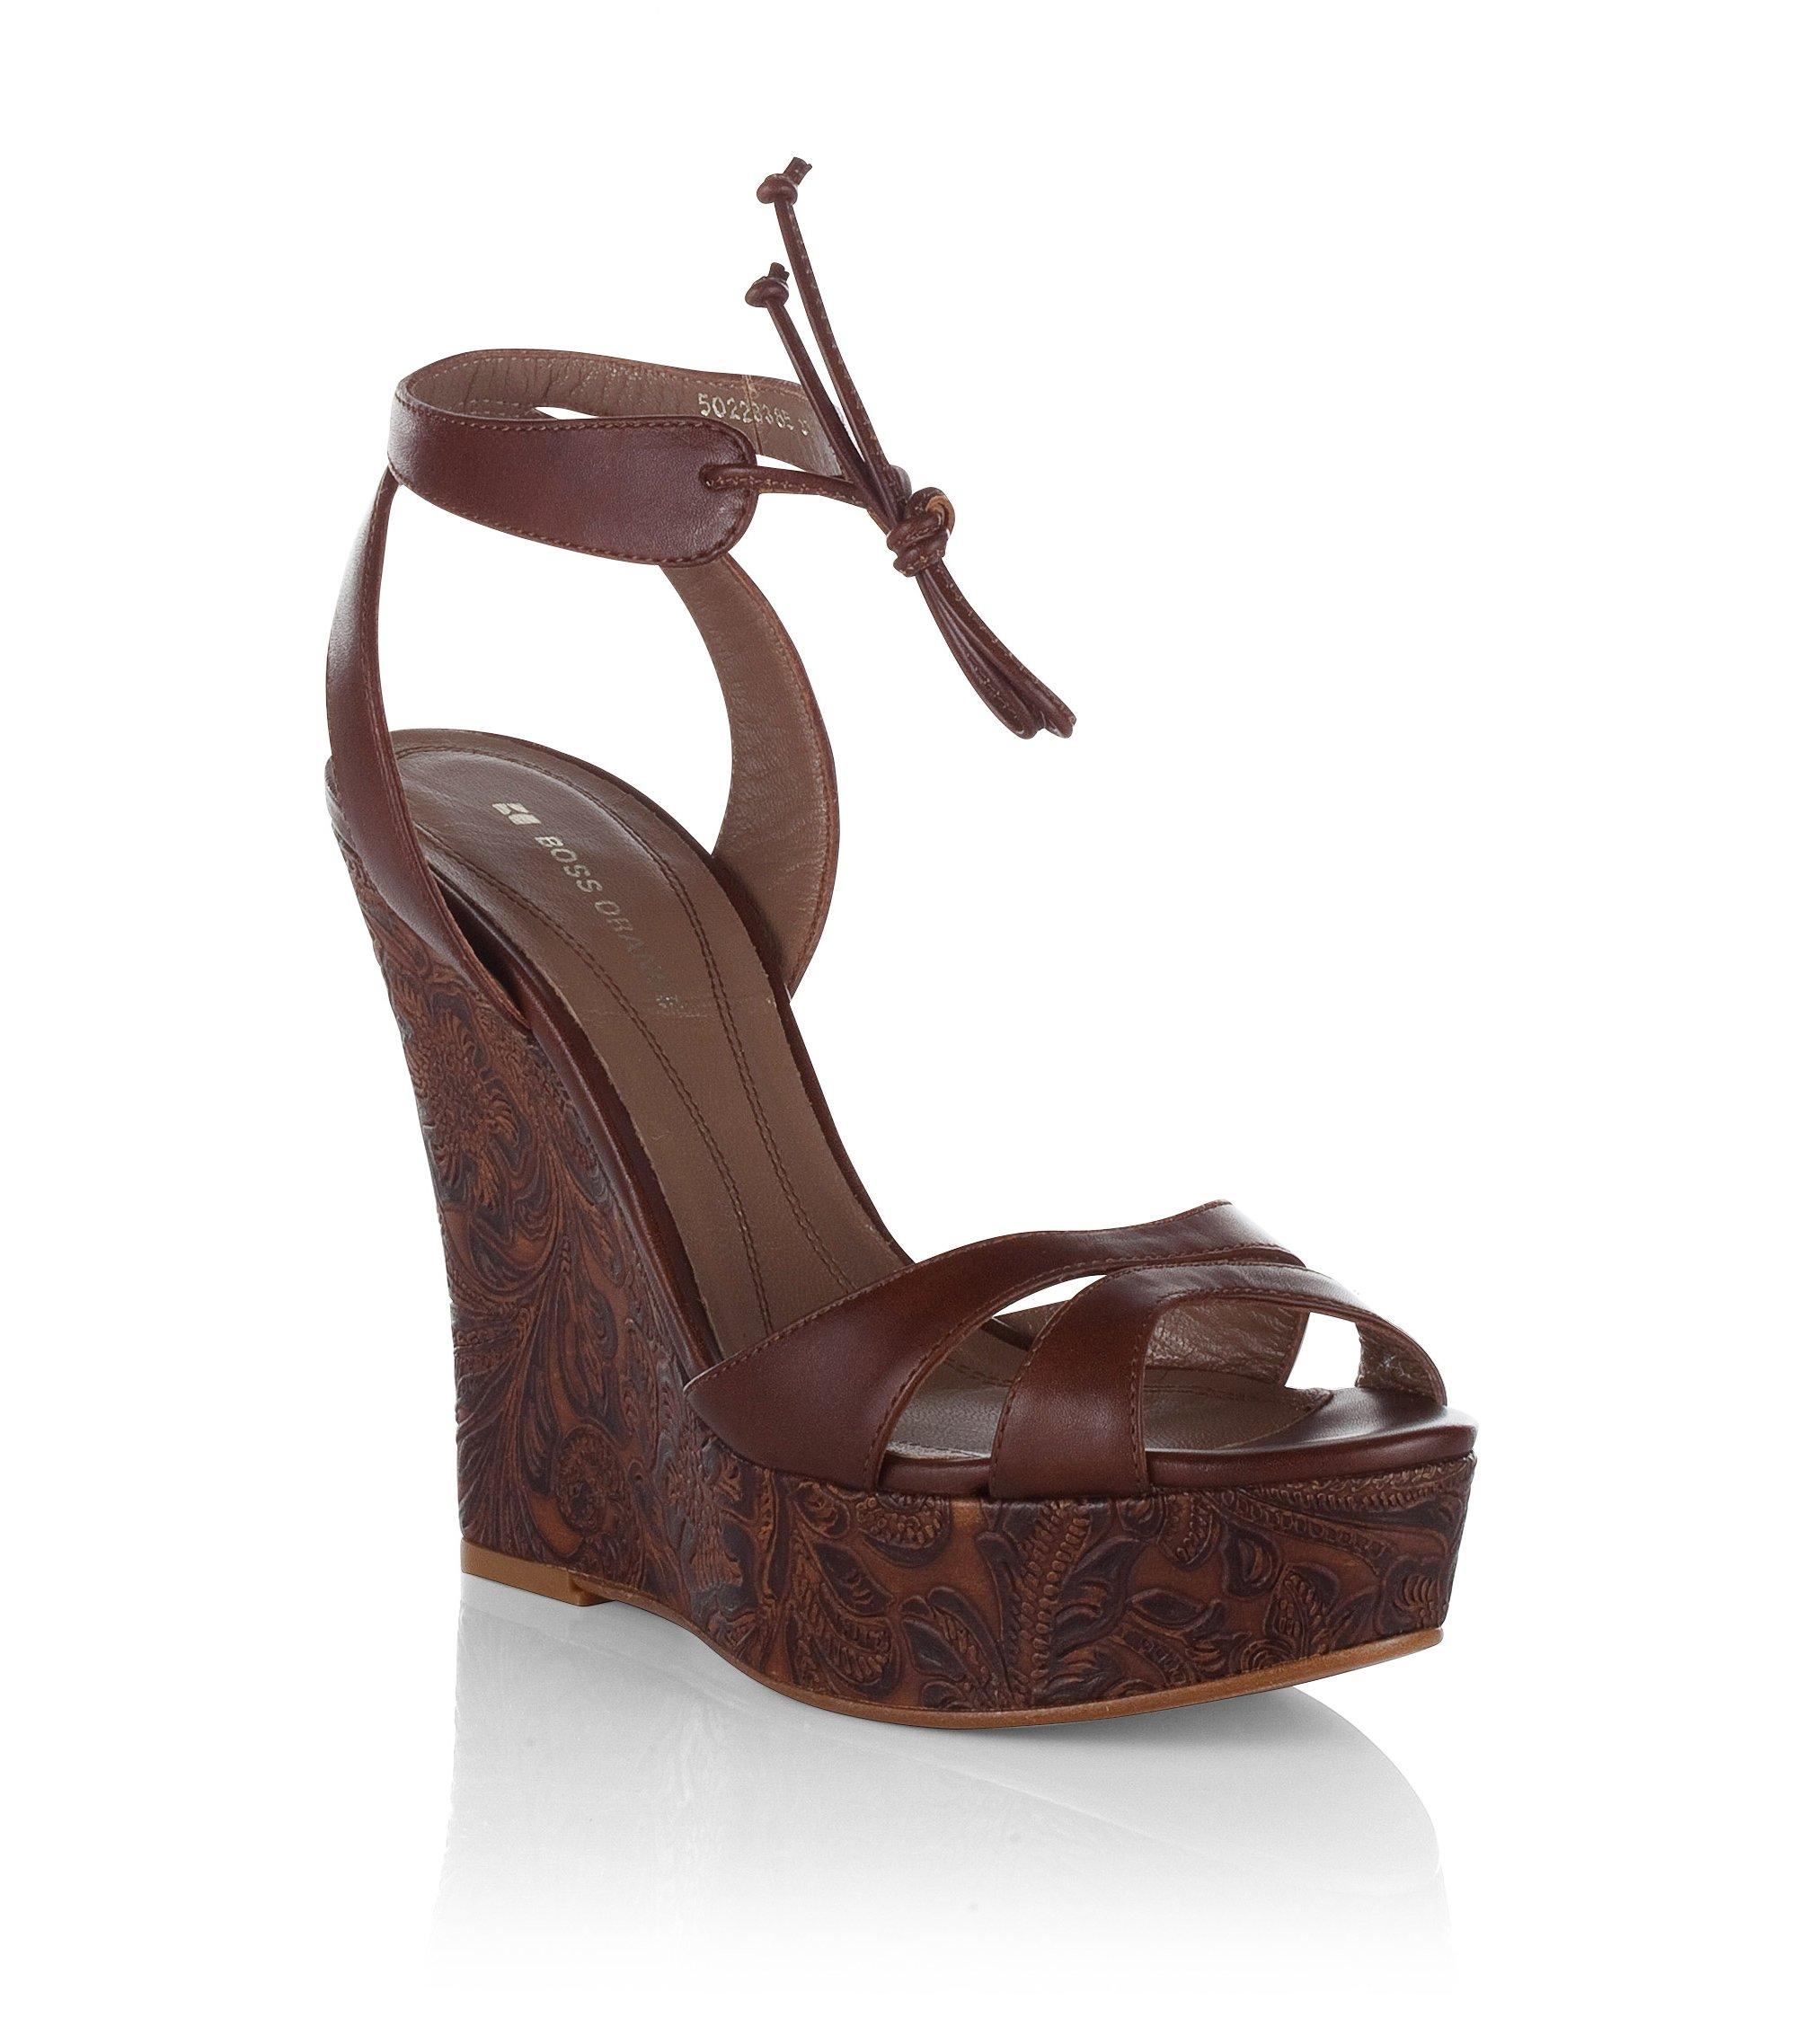 Sandale ´Jaret` mit Keilabsatz, Braun